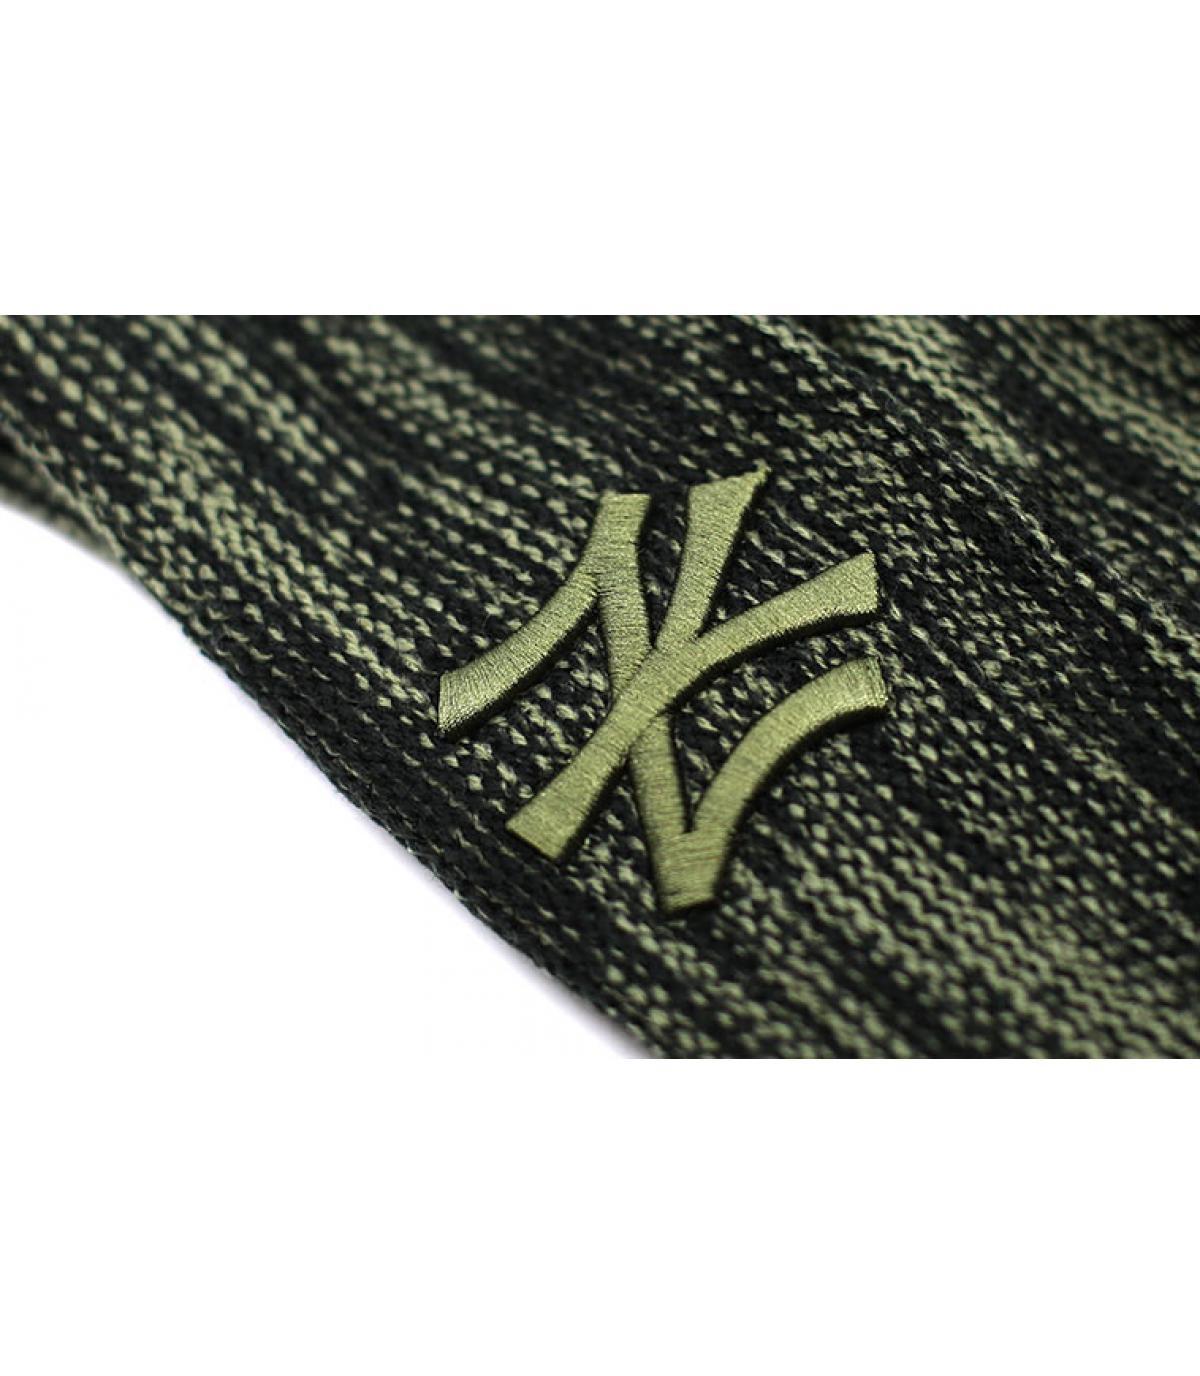 Détails Bonnet NY Marl Knit black Olive - image 3